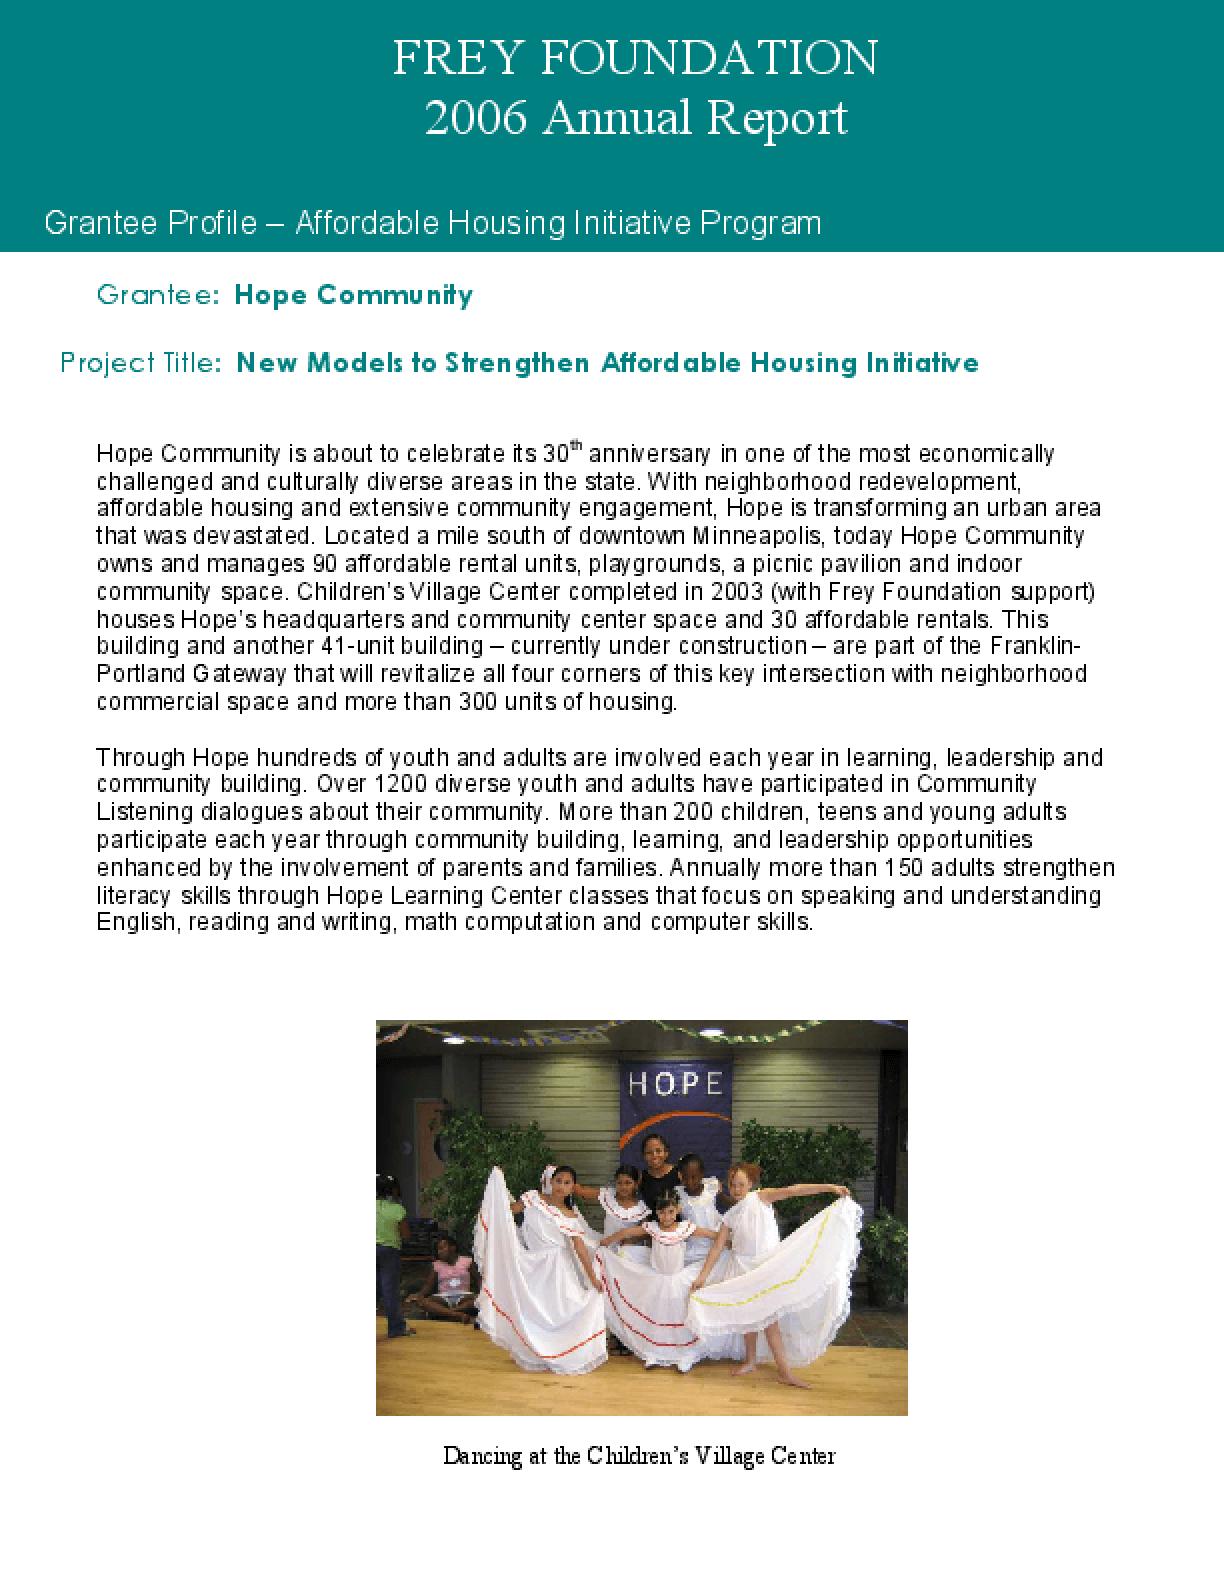 Frey Foundation - 2006 Annual Report